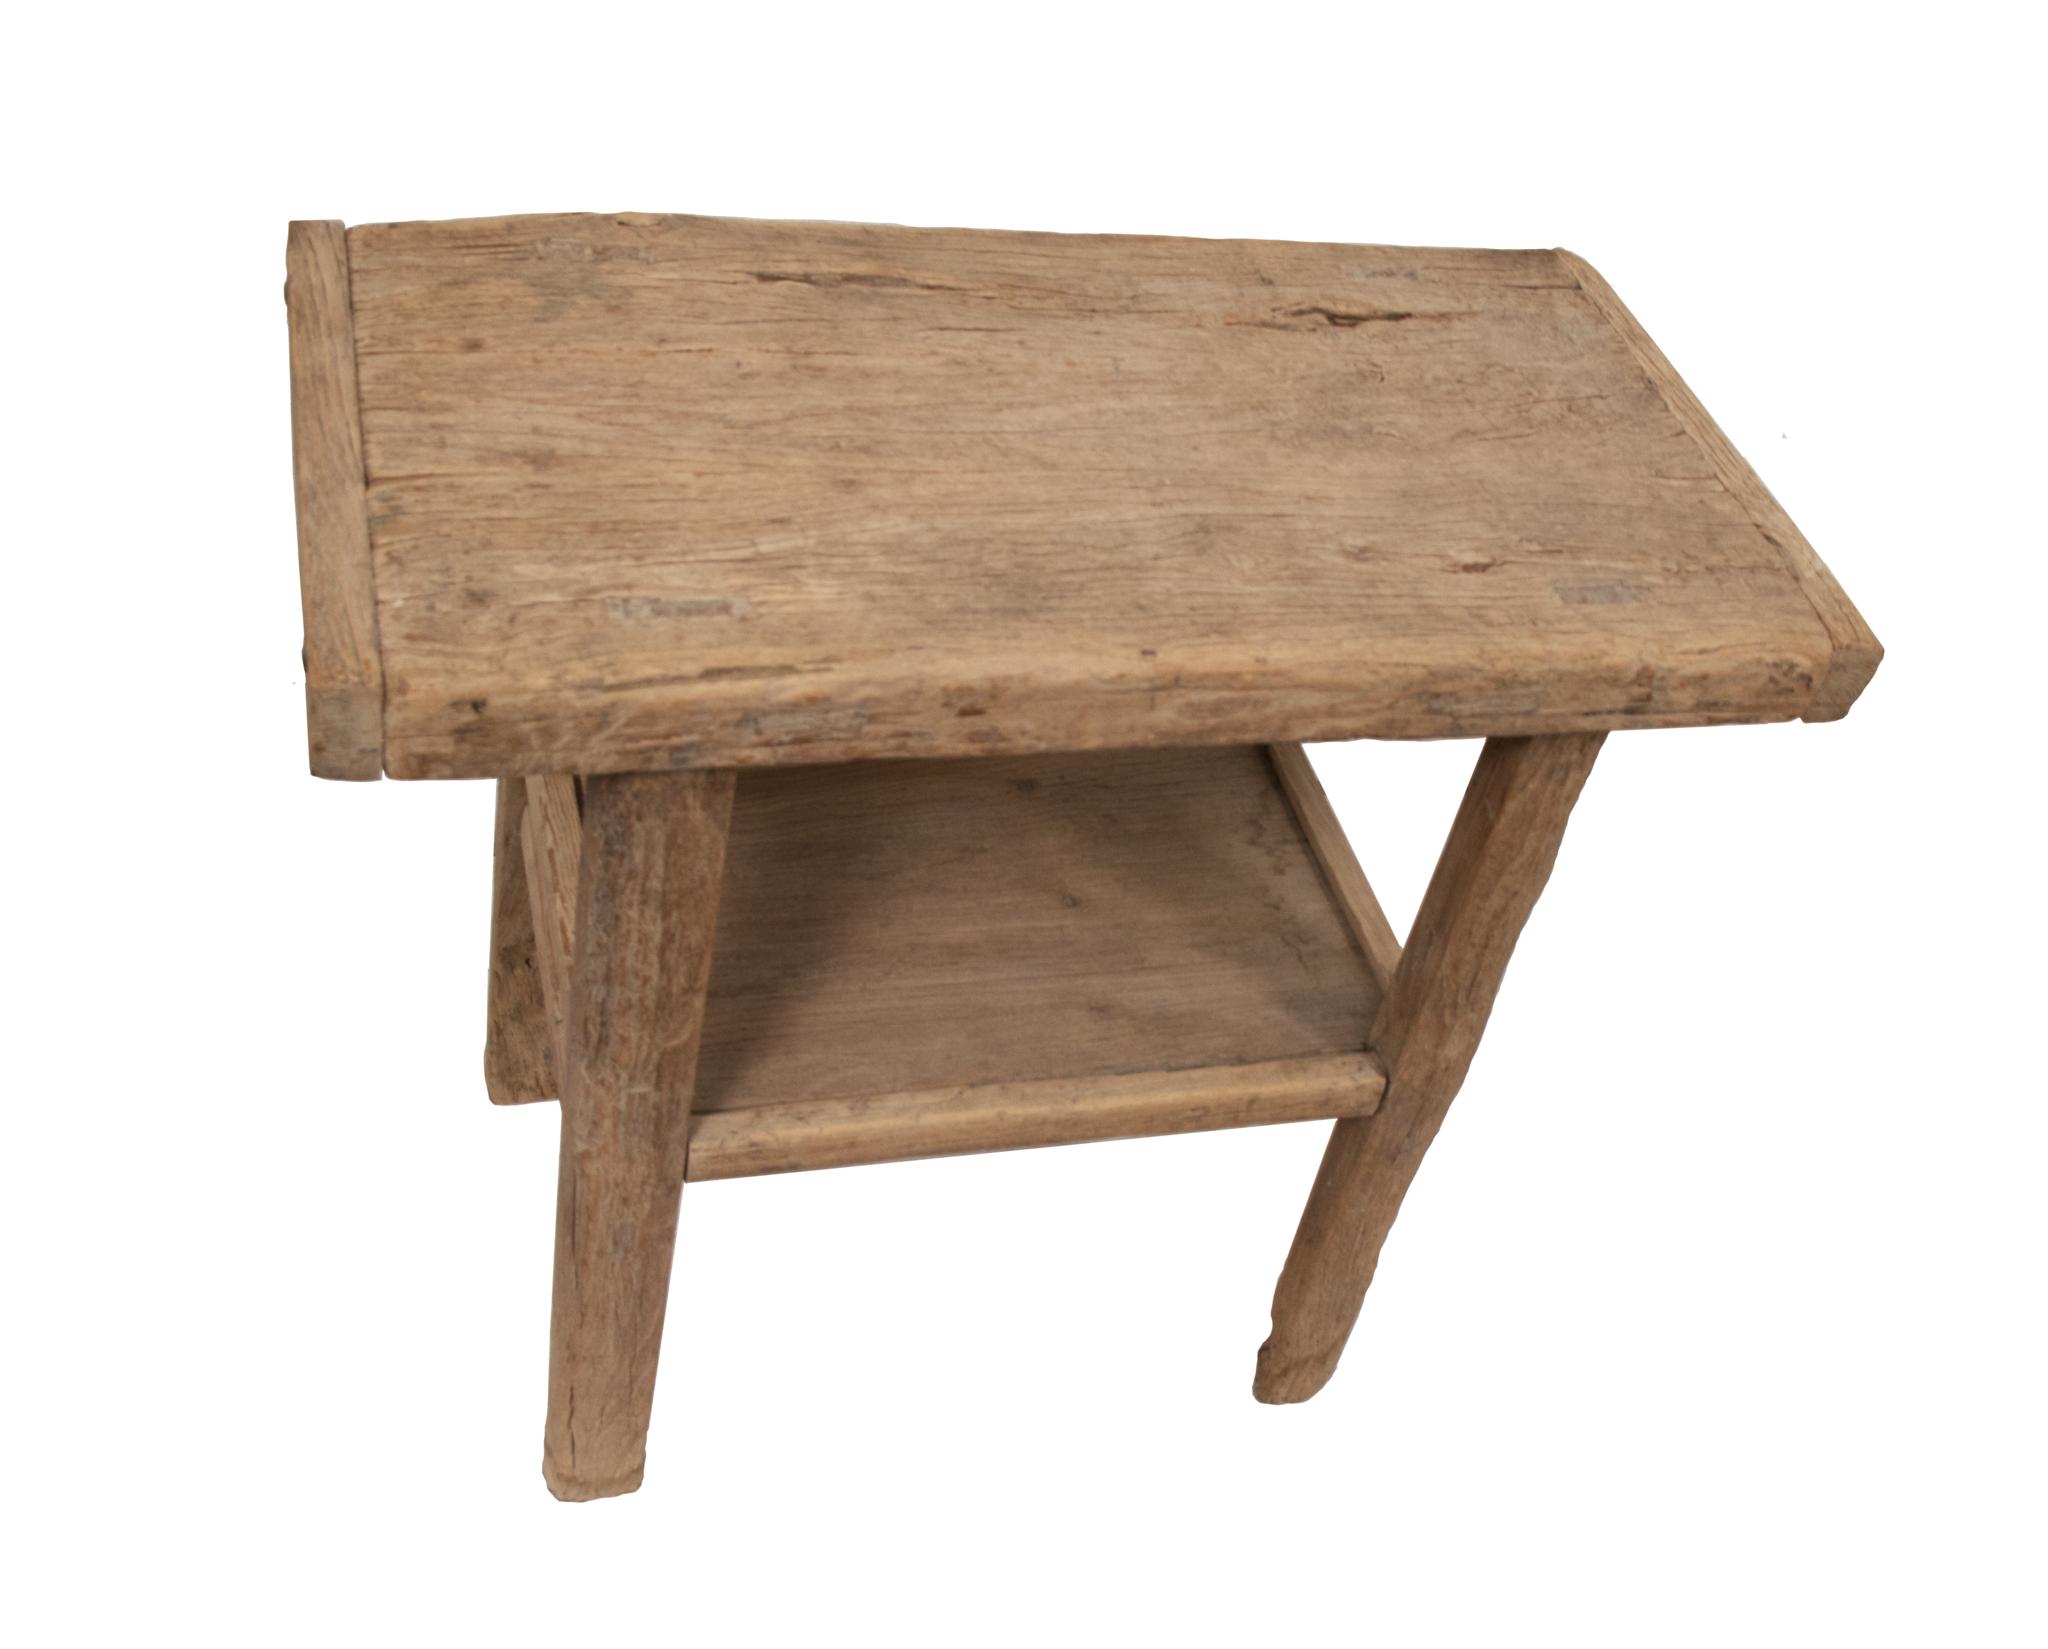 Consola de madera cruda - 101x48xh90cm - Madera de Olmo